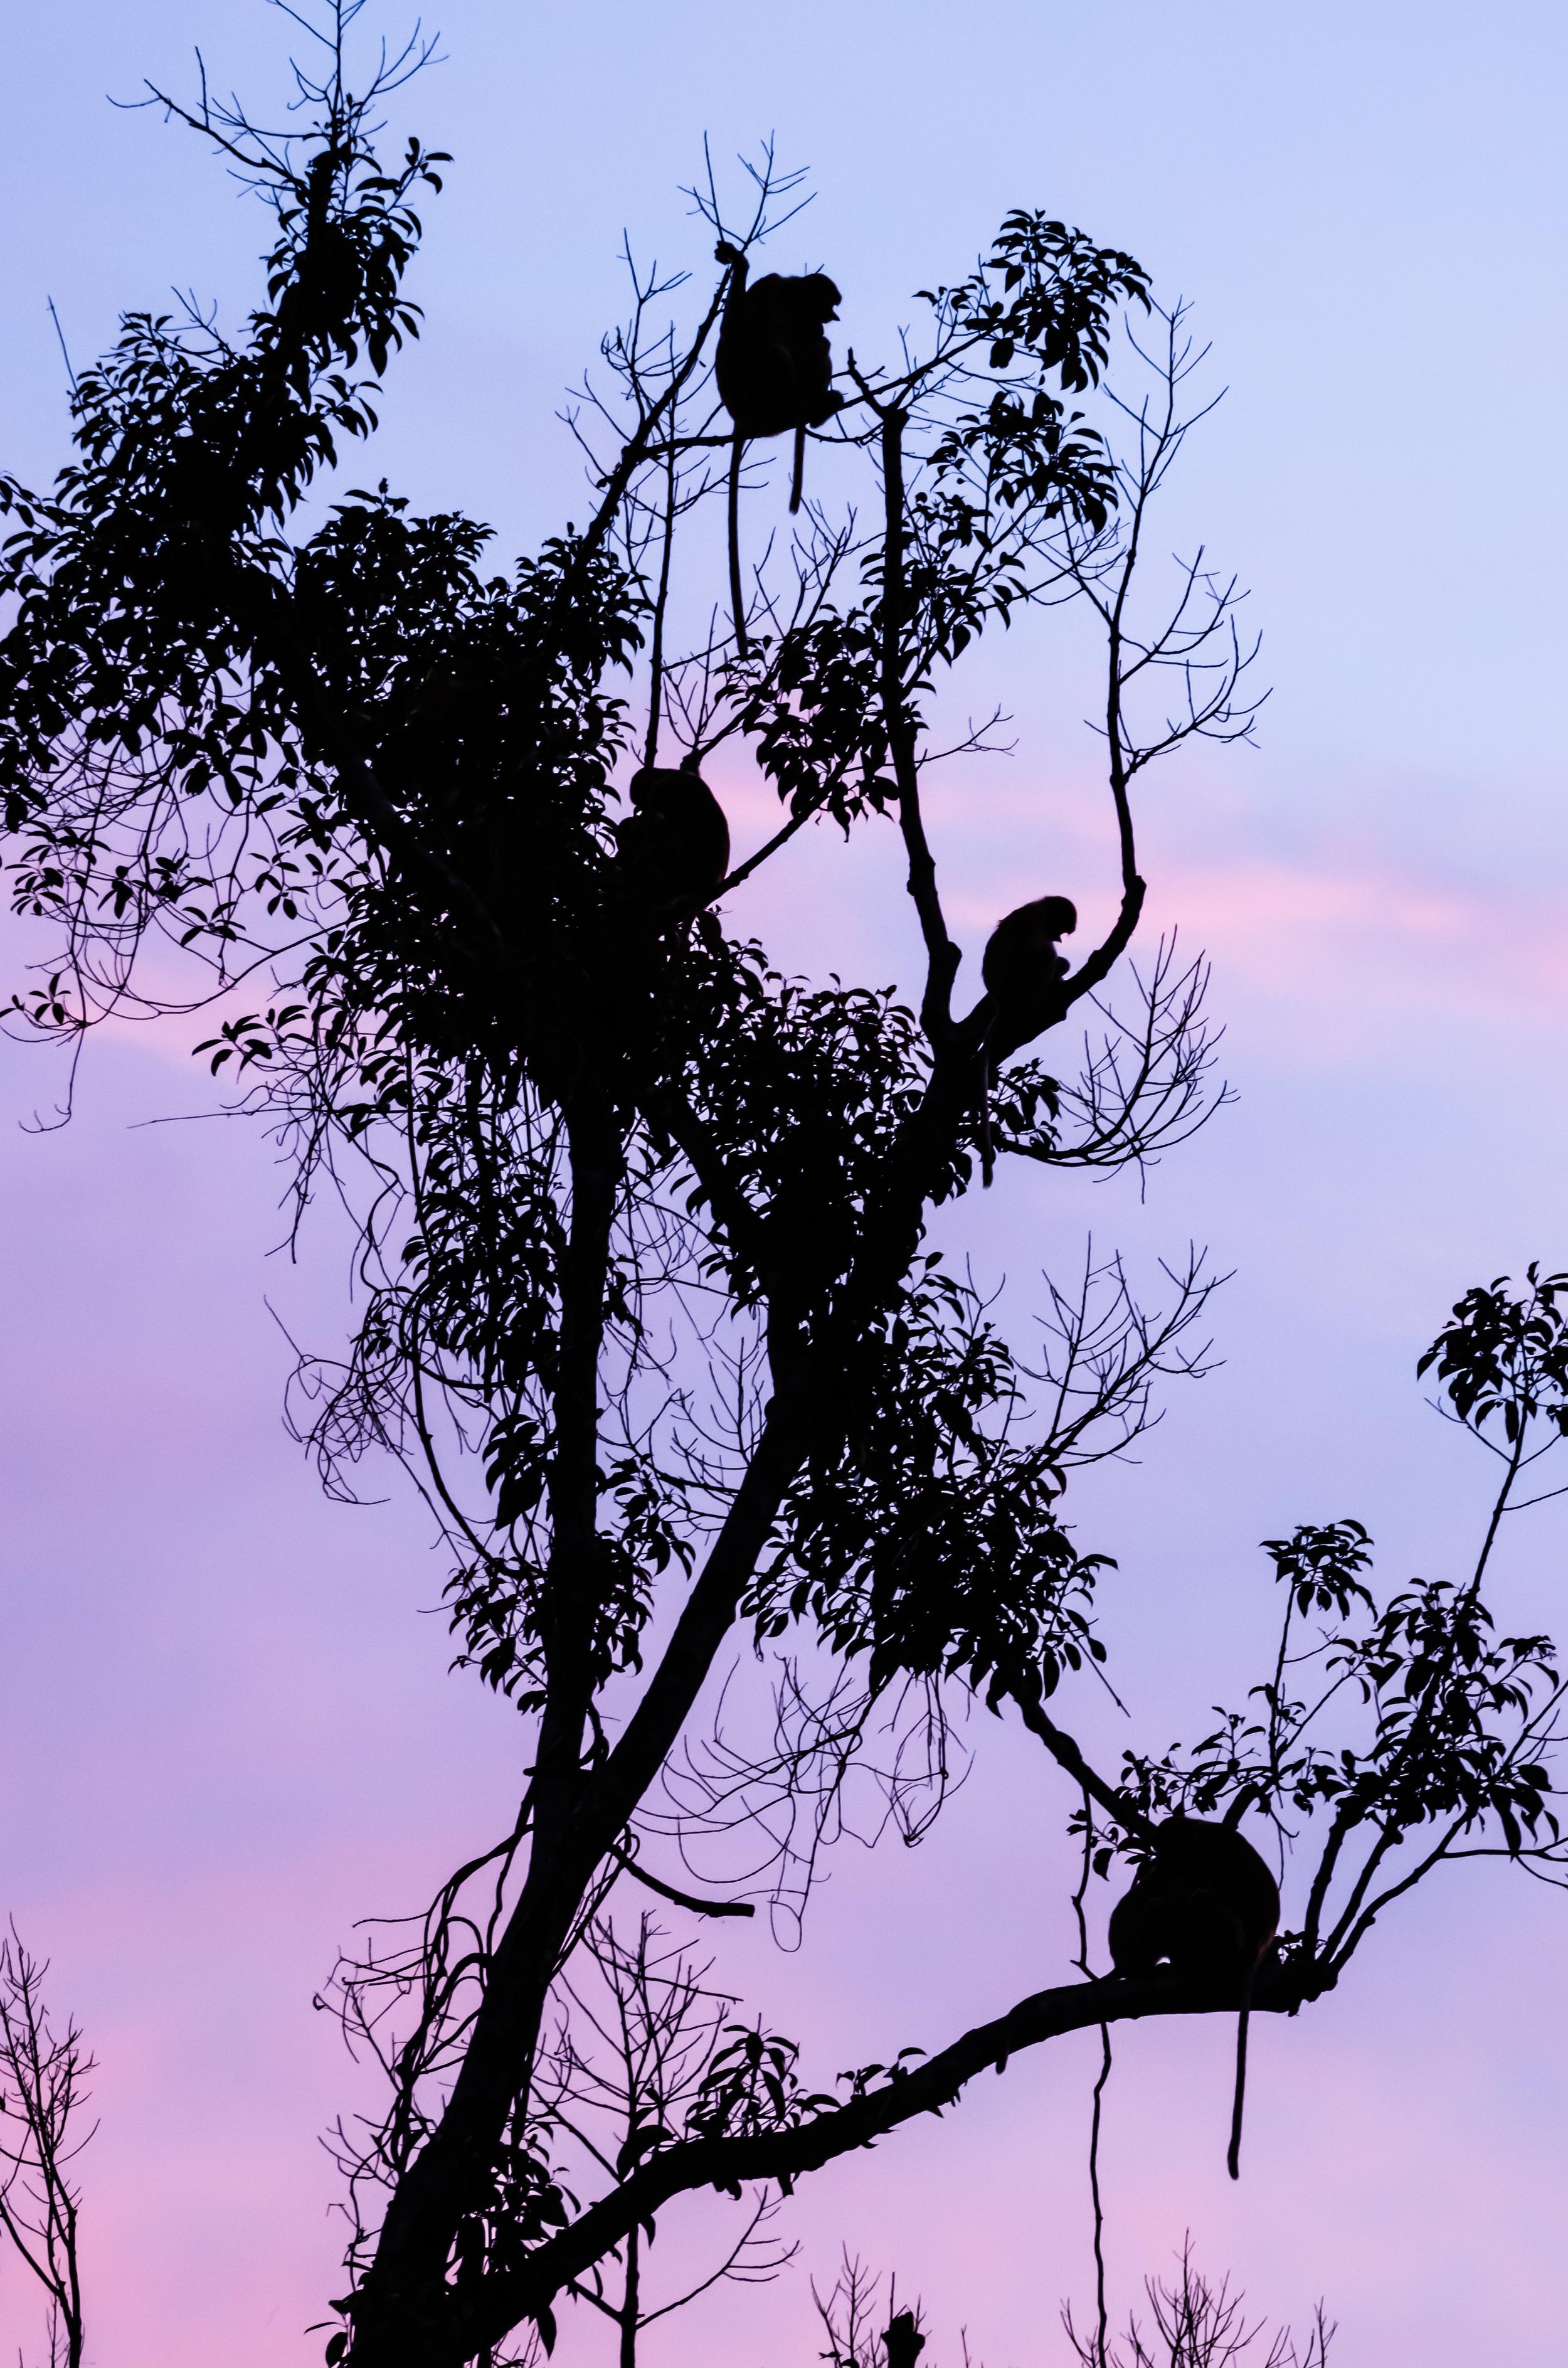 proboscis-in-tree.jpg